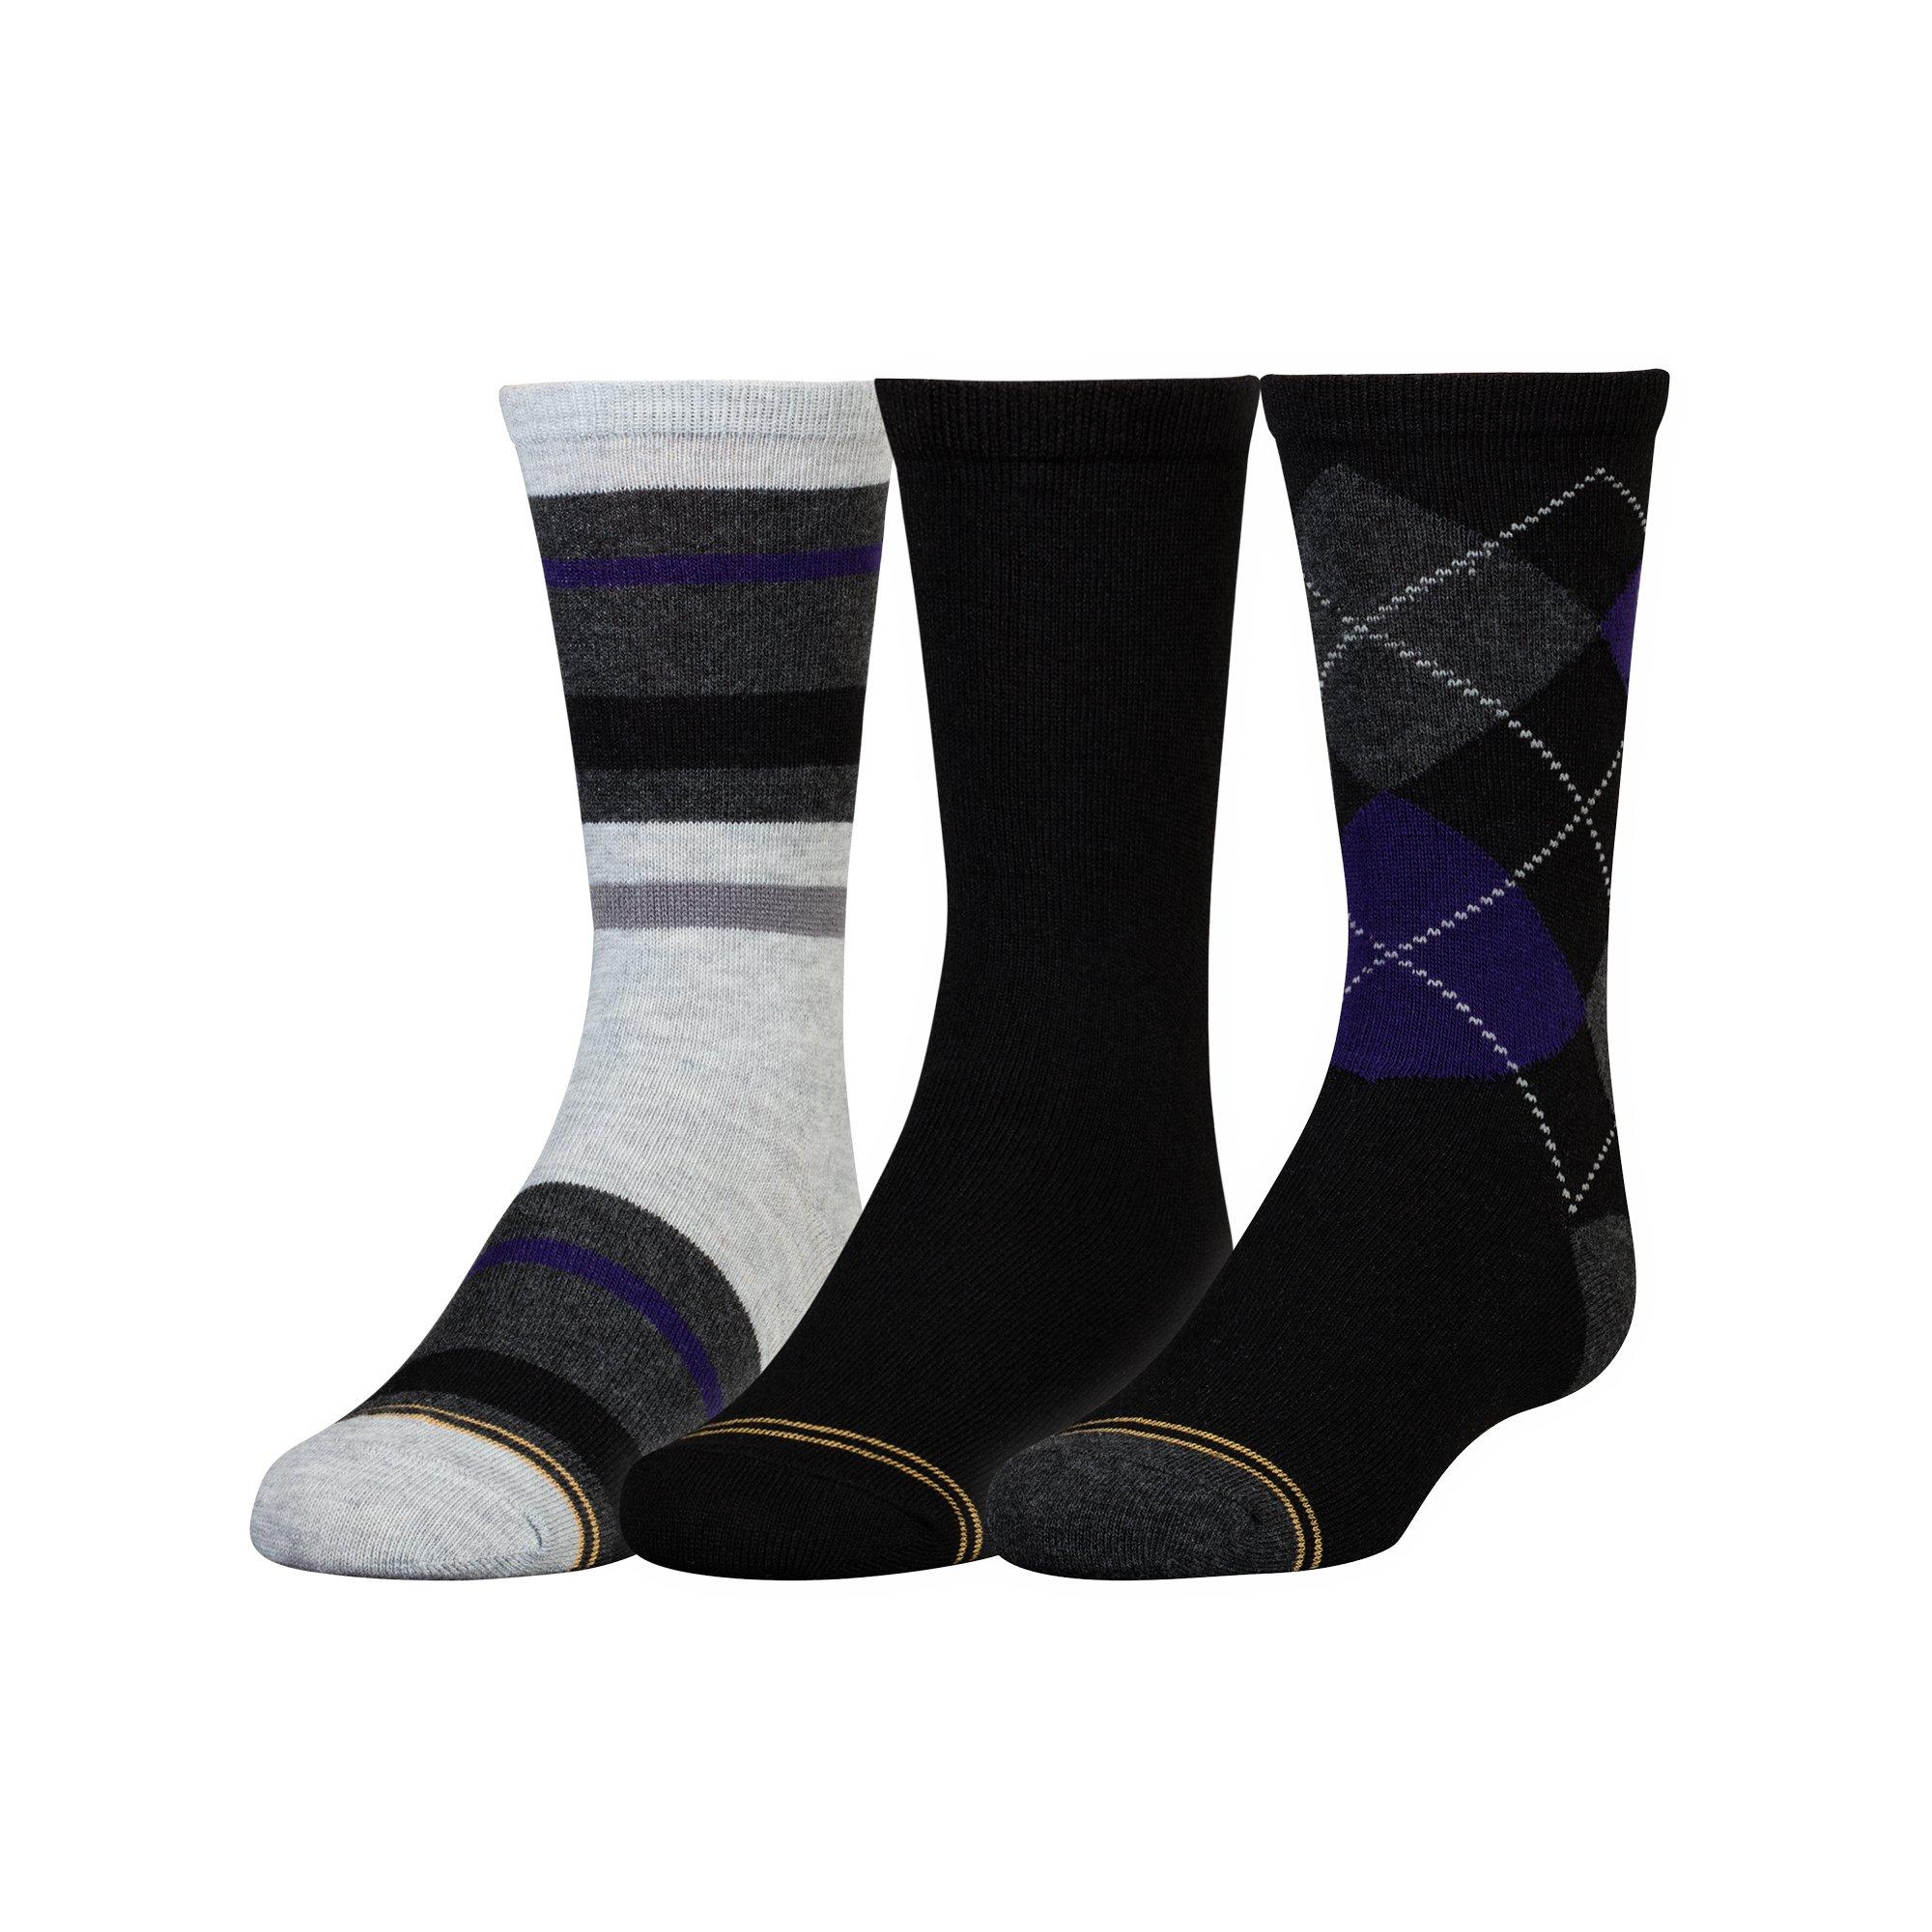 Gold Toe Big Boys' 3 Pack Fashion Dress Crew, Black Purple Argyle/Black/Stripe Grey/Heather Purple, Medium